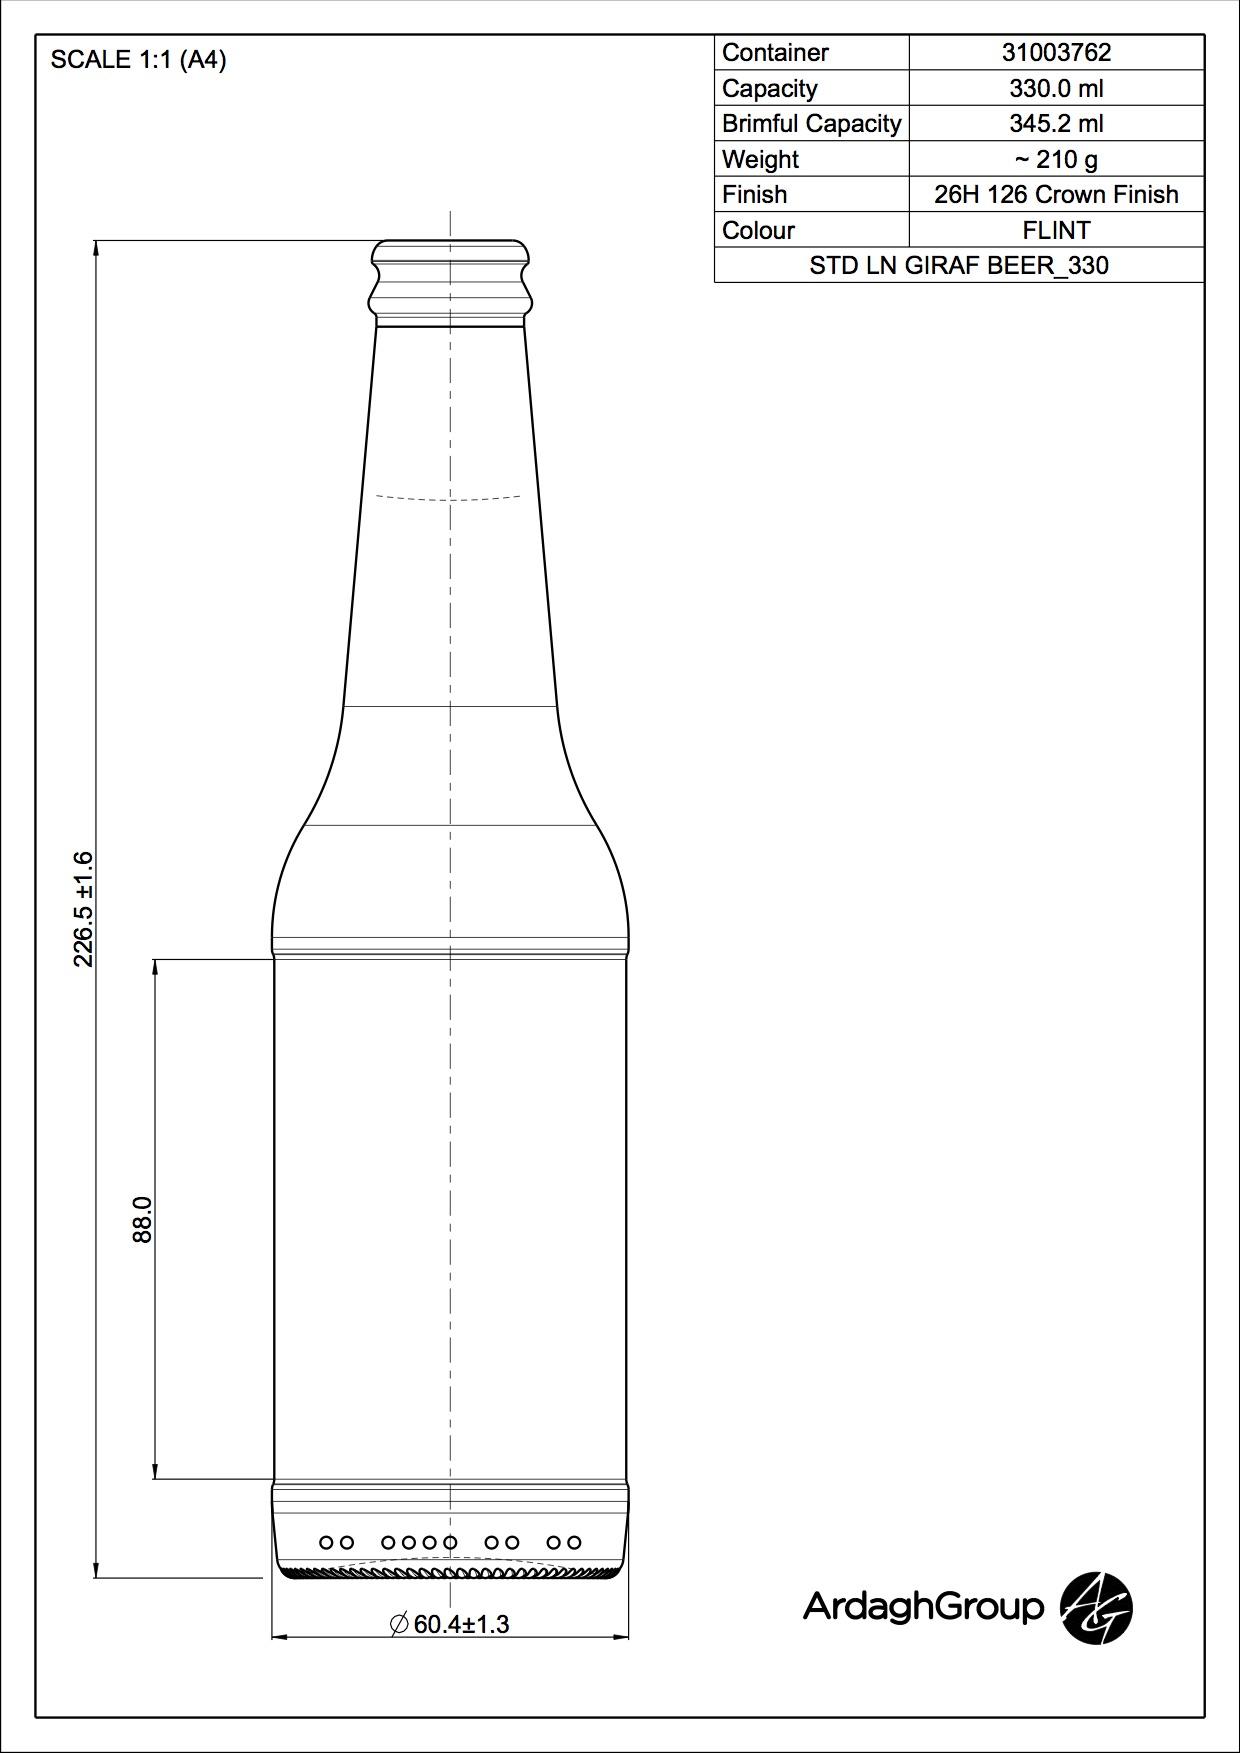 330ml Flint Glass Longneck Giraf Beer Bottle 31003762